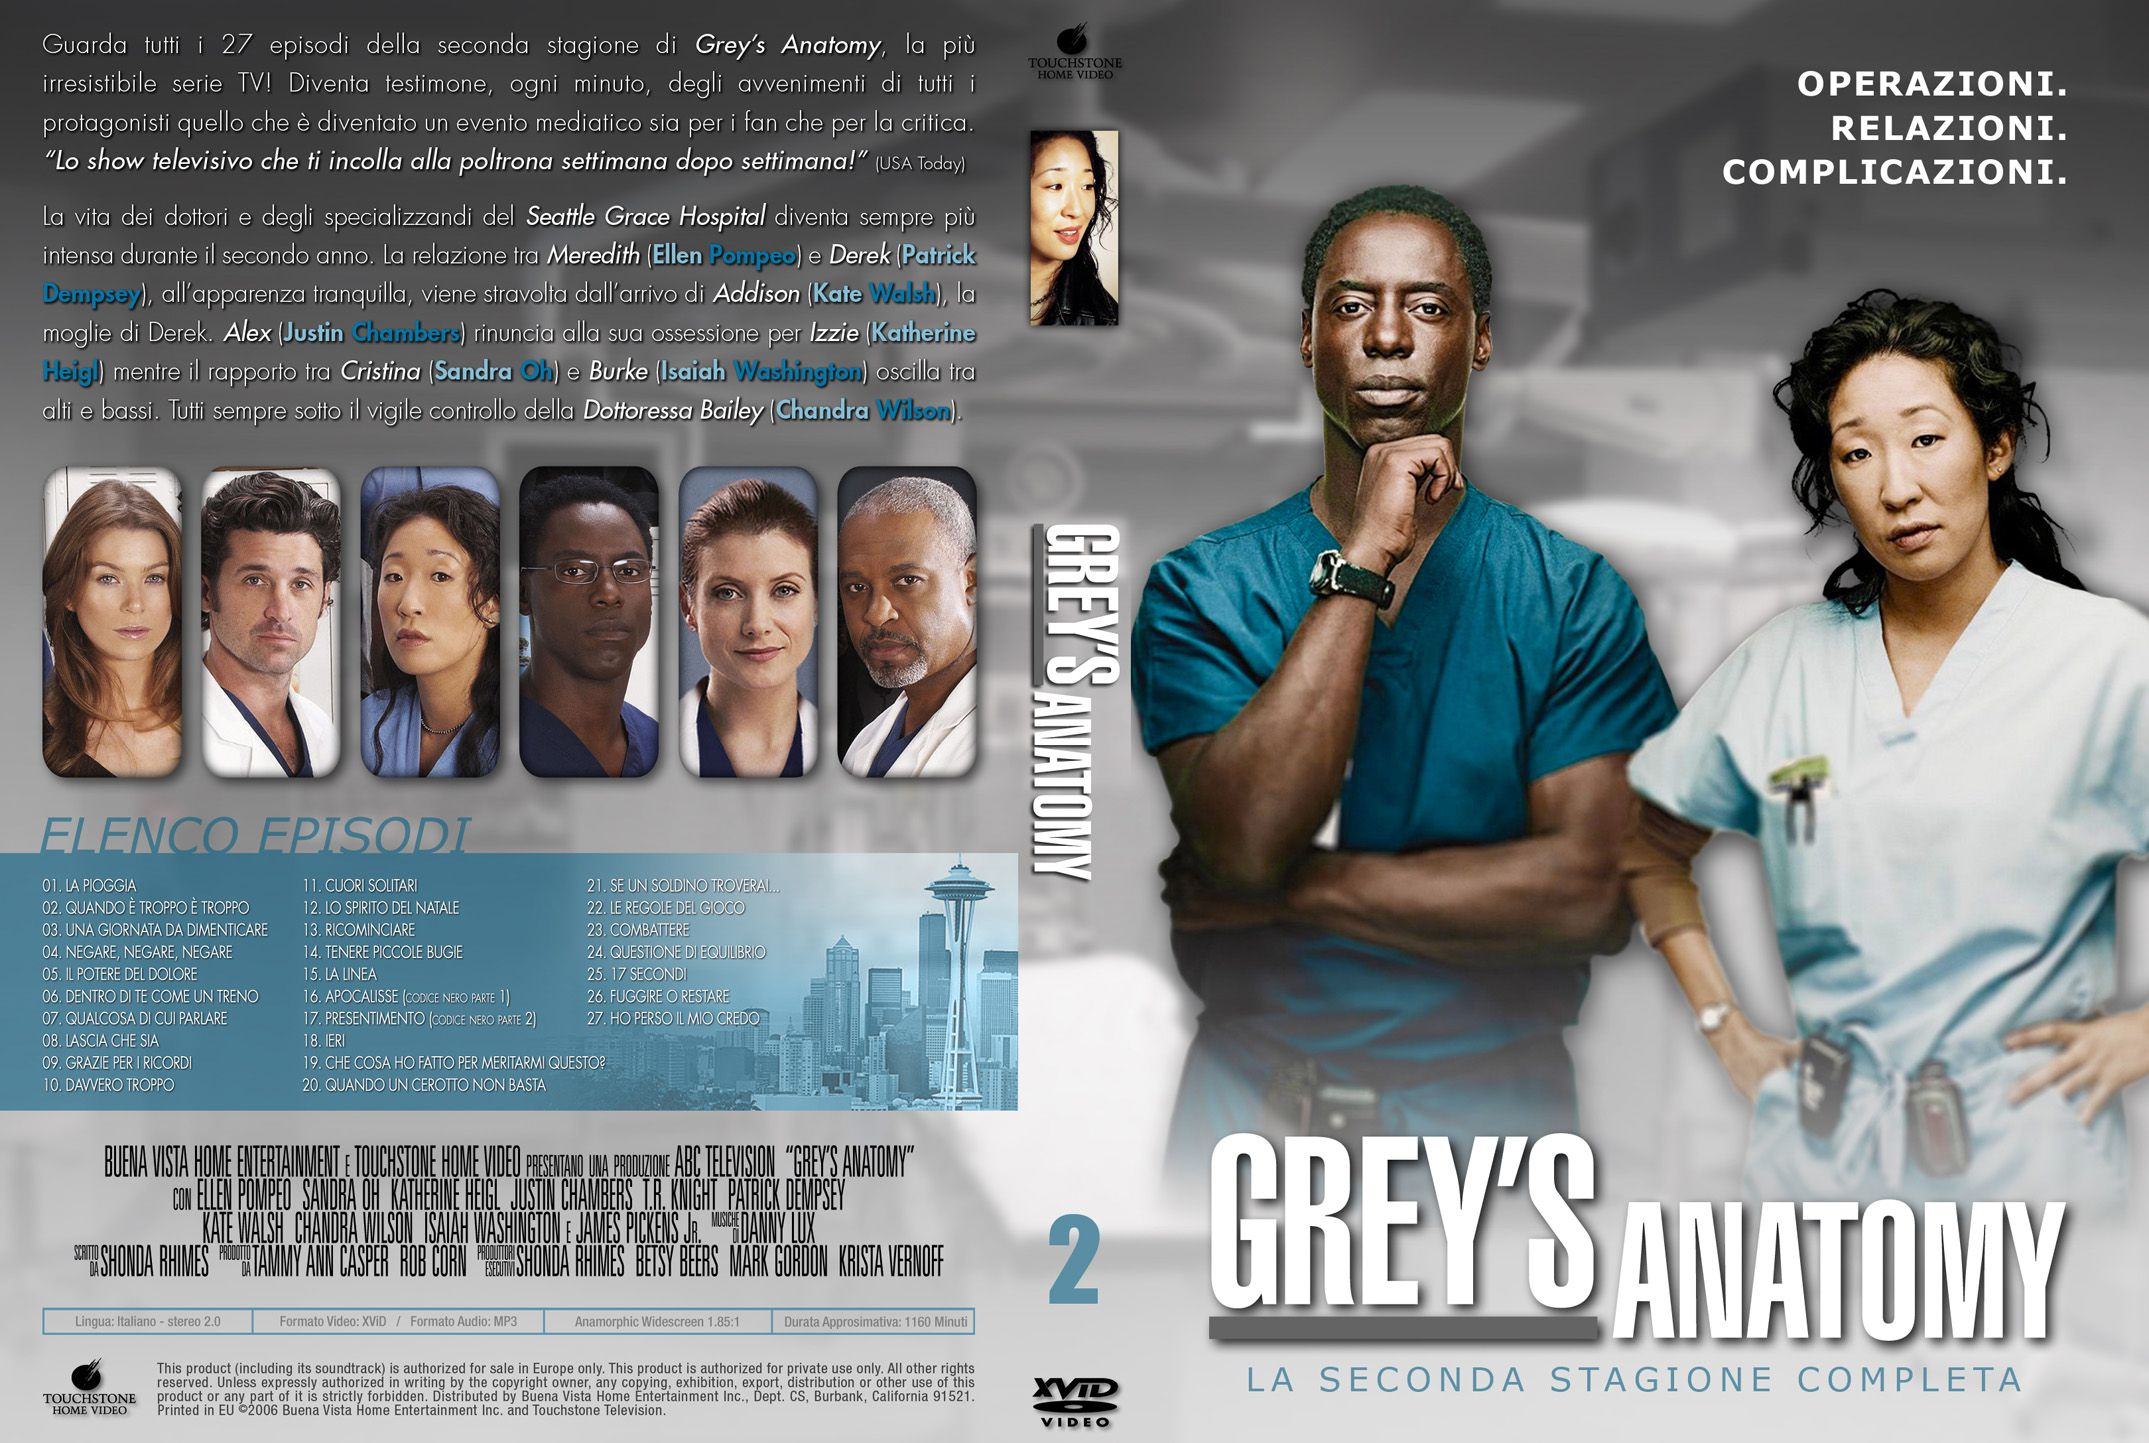 Summary greys anatomy season 1 : Shield seasons 2